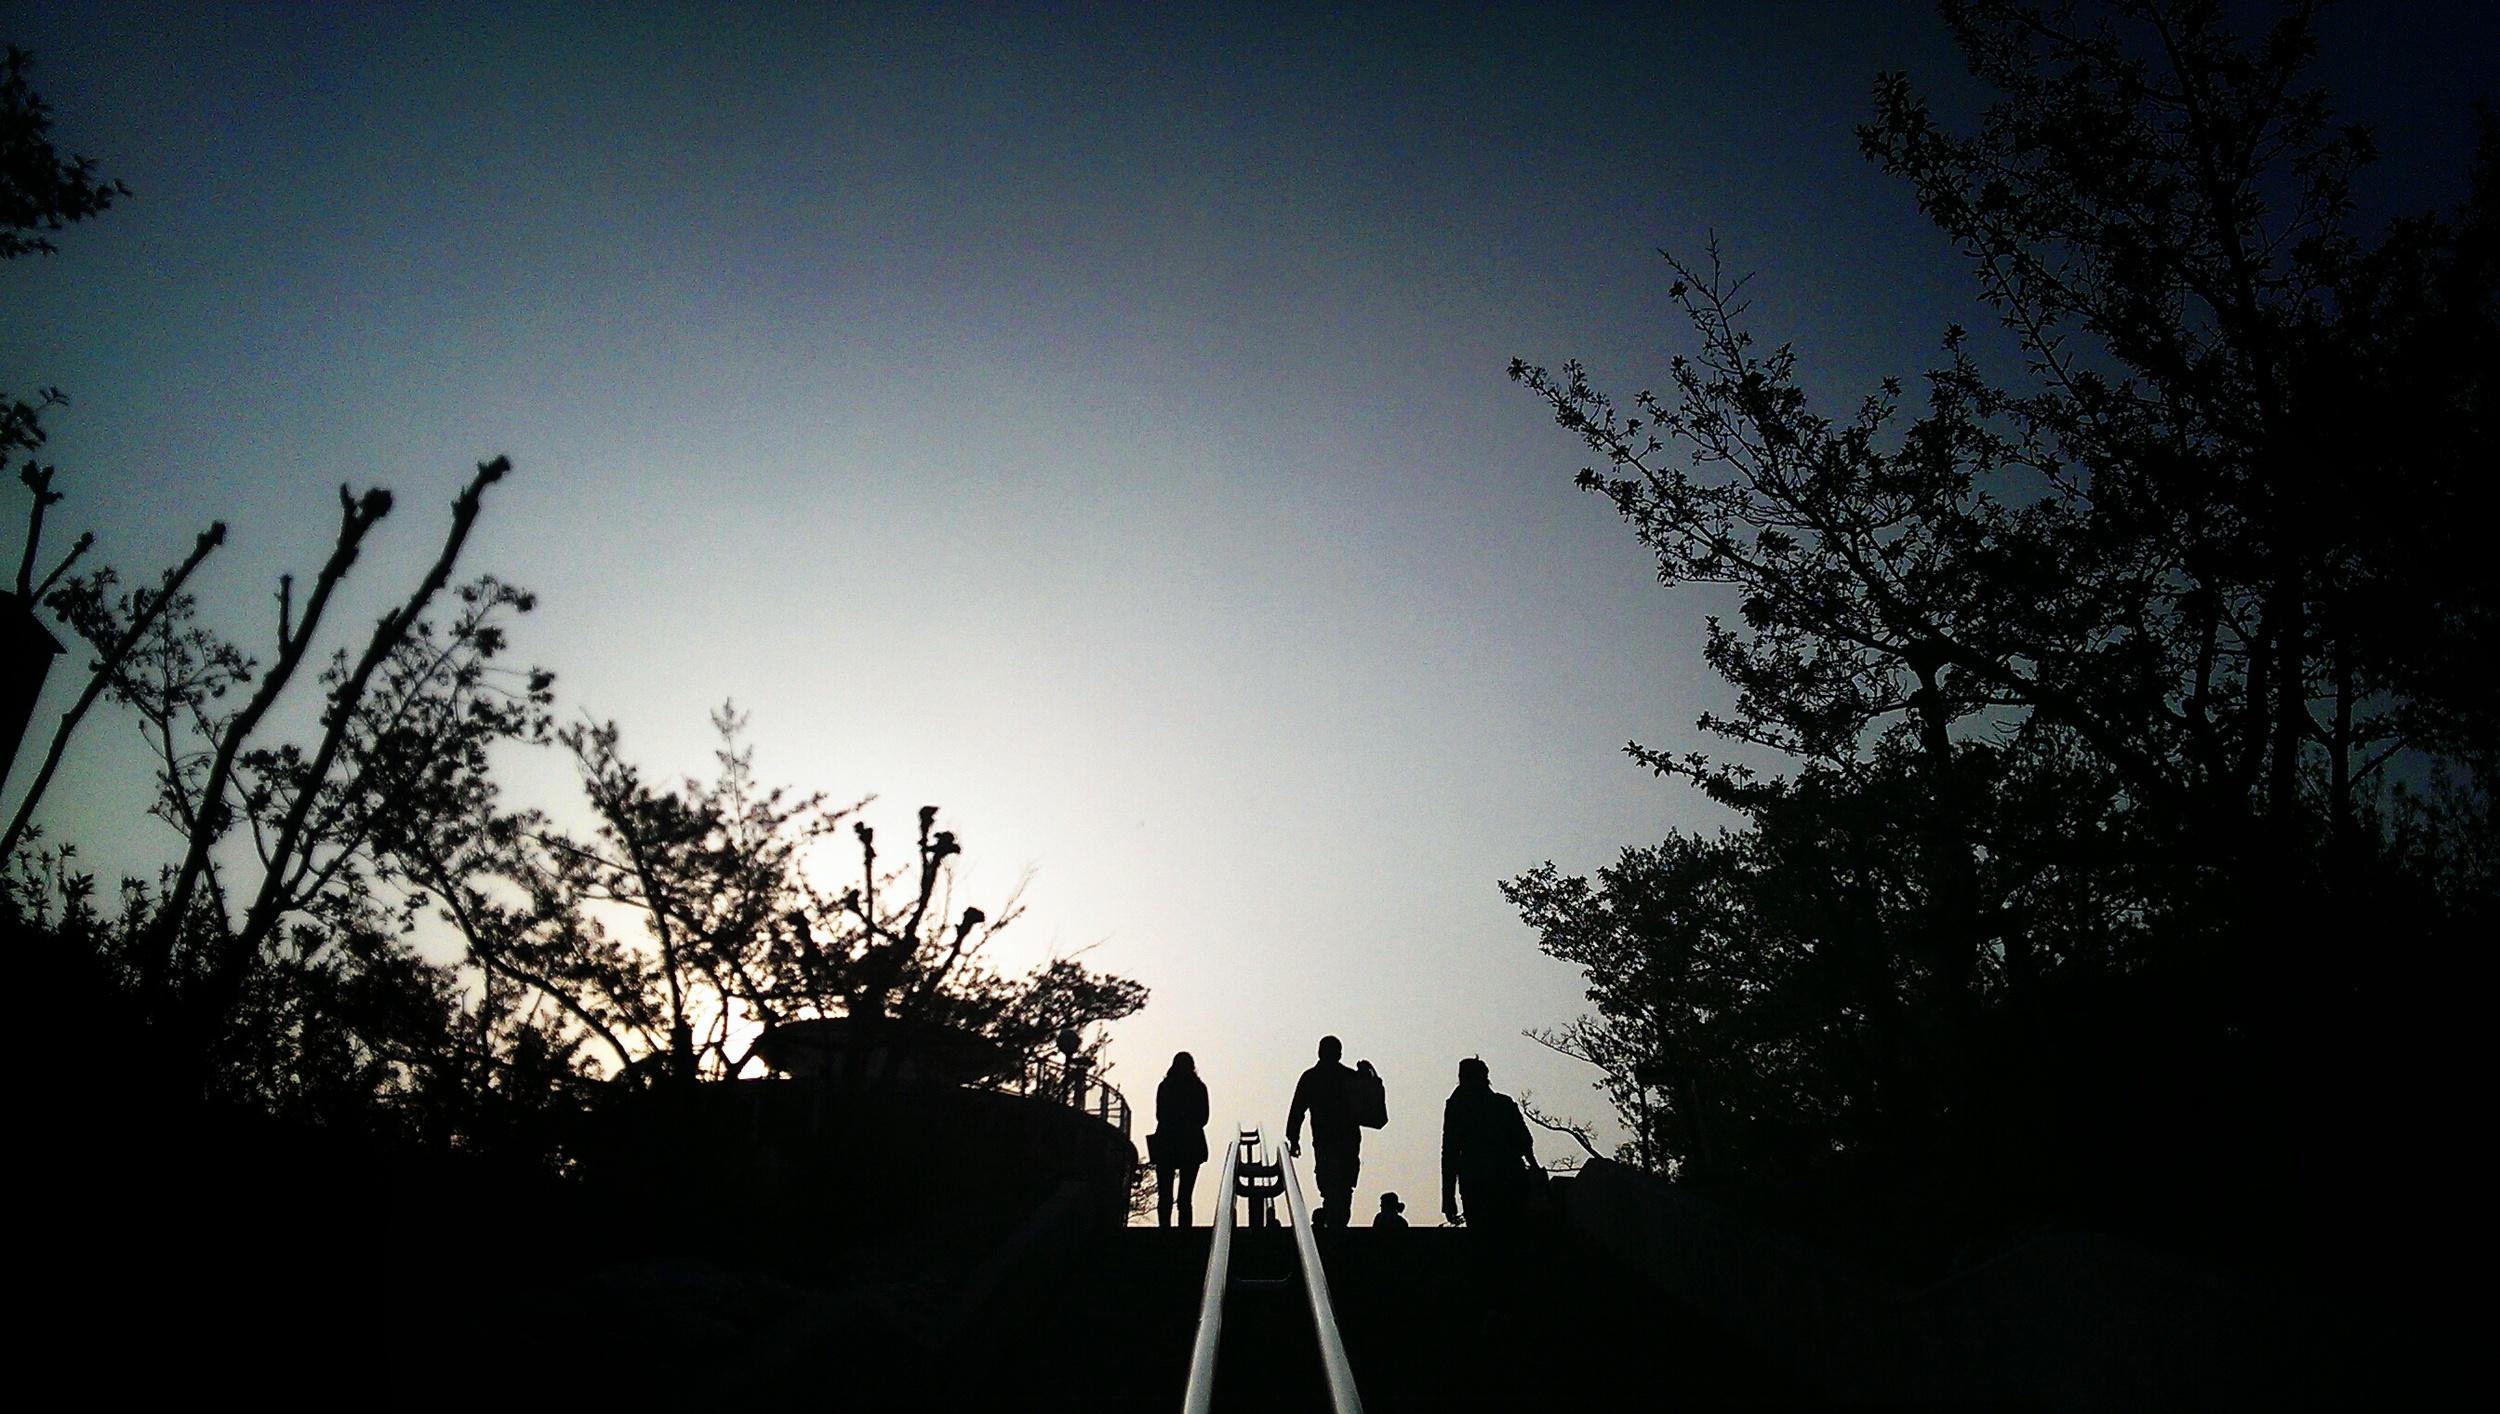 Reaching the summit of Mt Senkoji in Onomichi City, part of Hiroshima Prefecture, Japan.